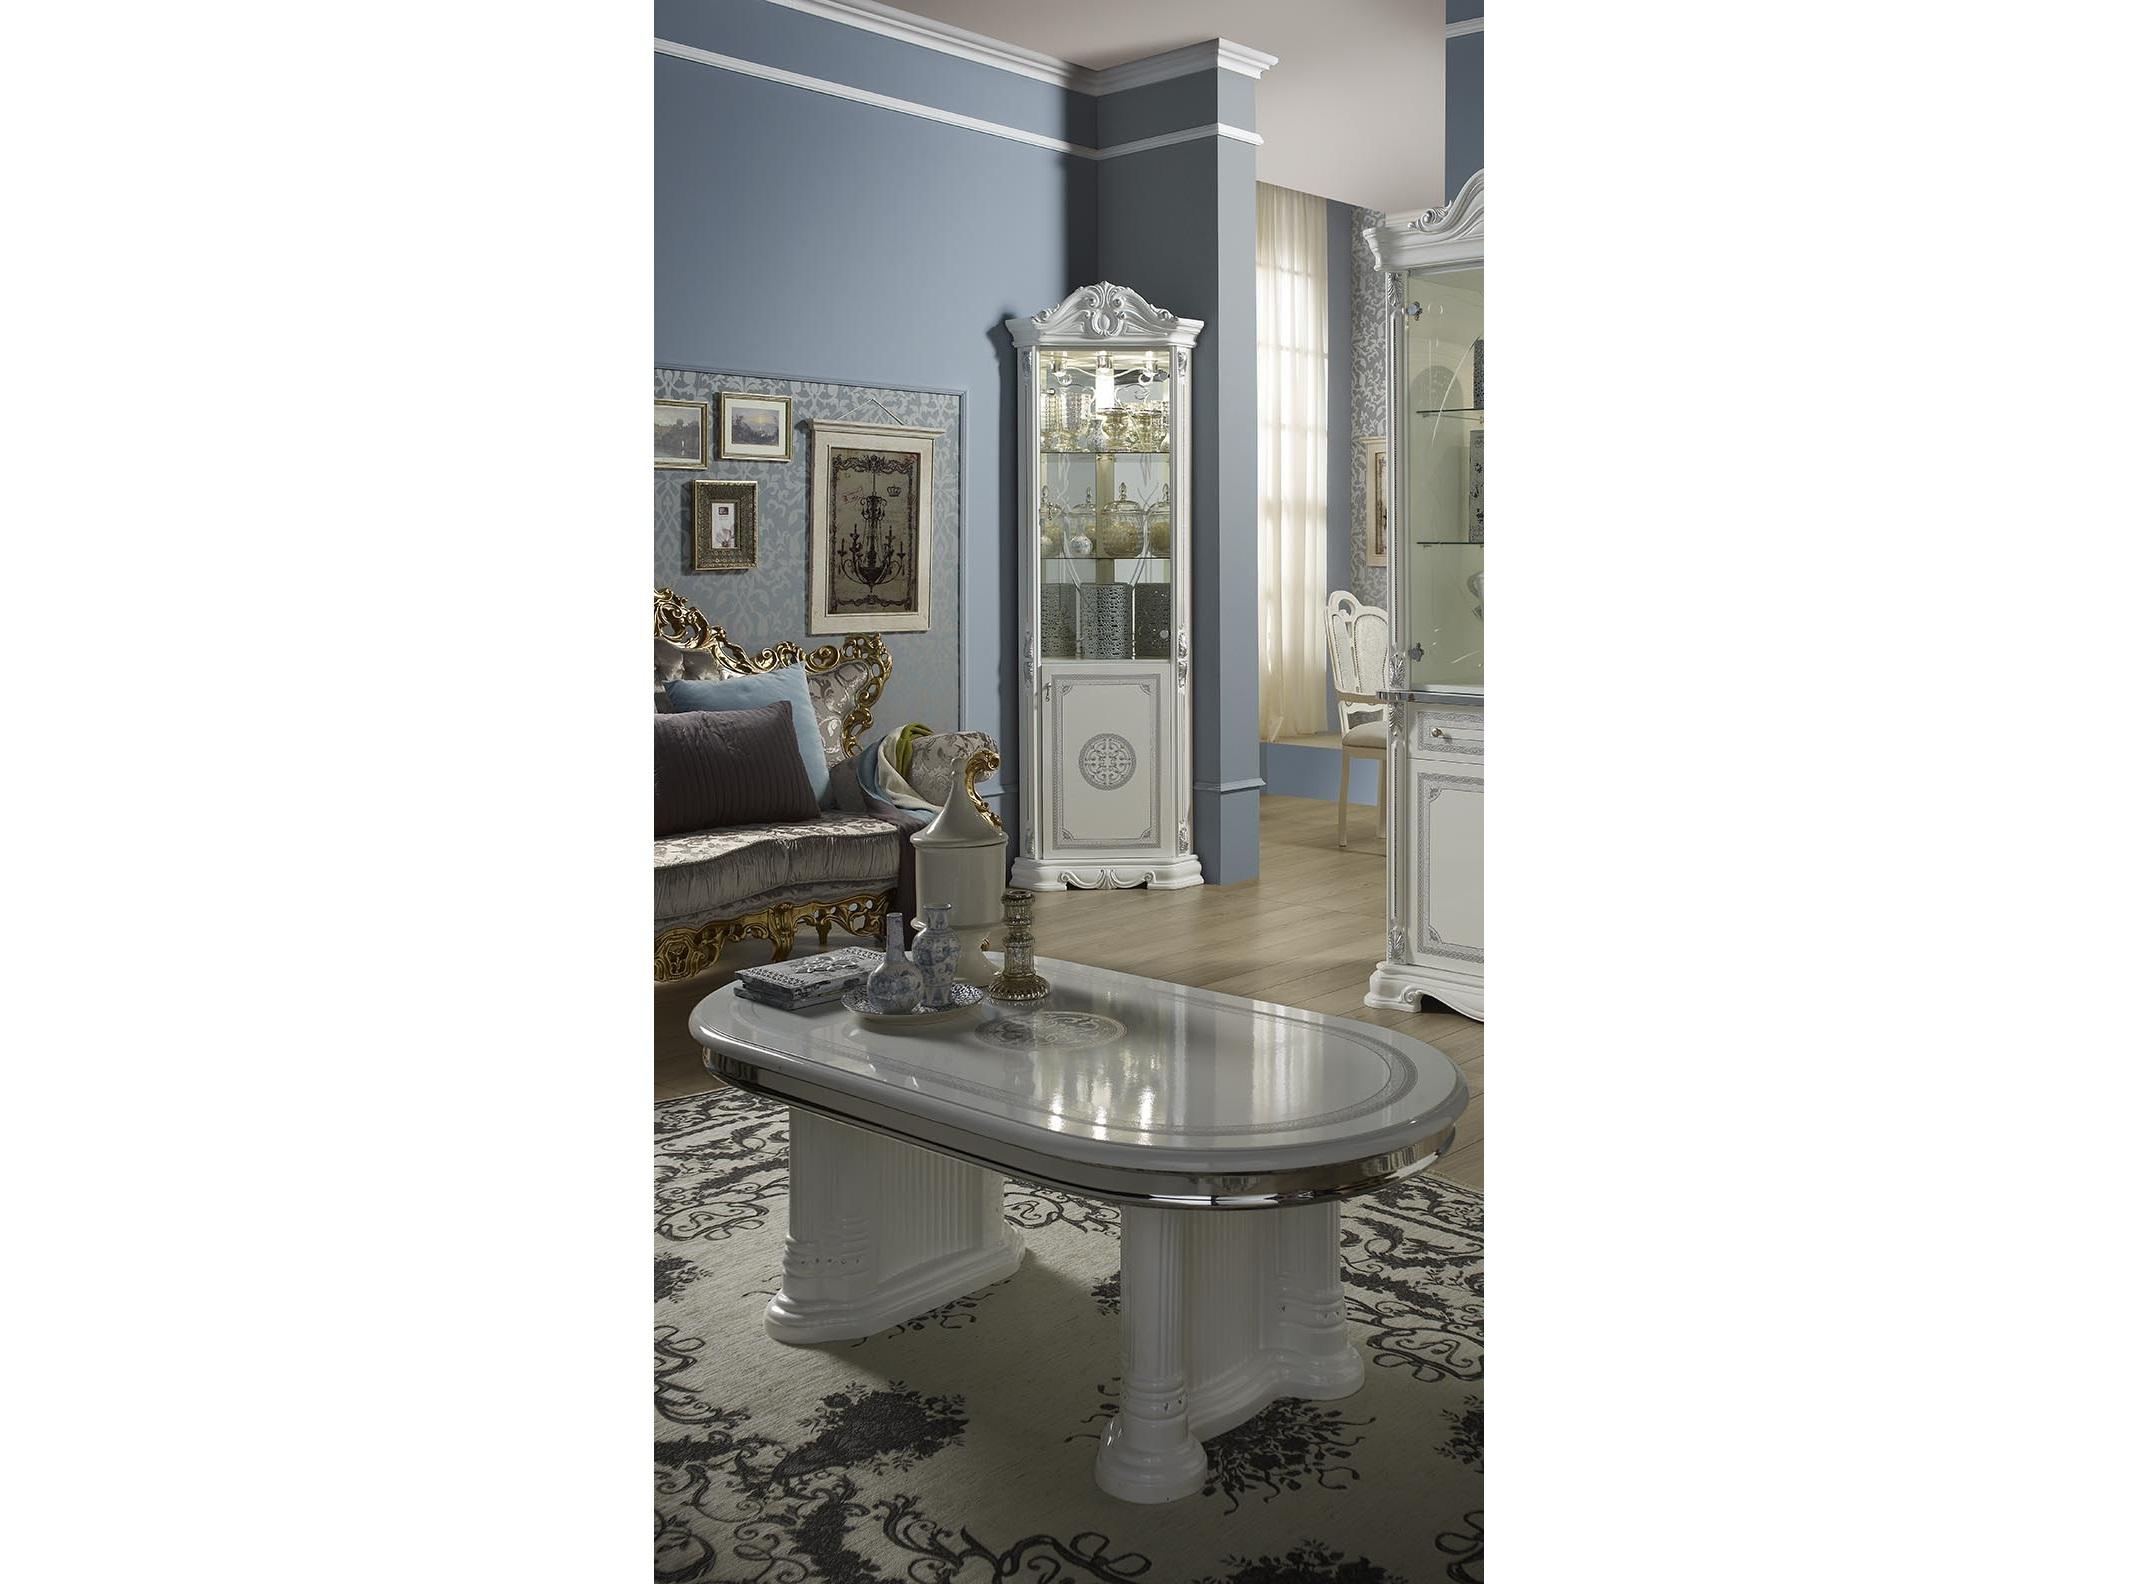 schlafzimmer great weiss silber klassische design italienisch 18 xp pfgrcca4c bsp. Black Bedroom Furniture Sets. Home Design Ideas